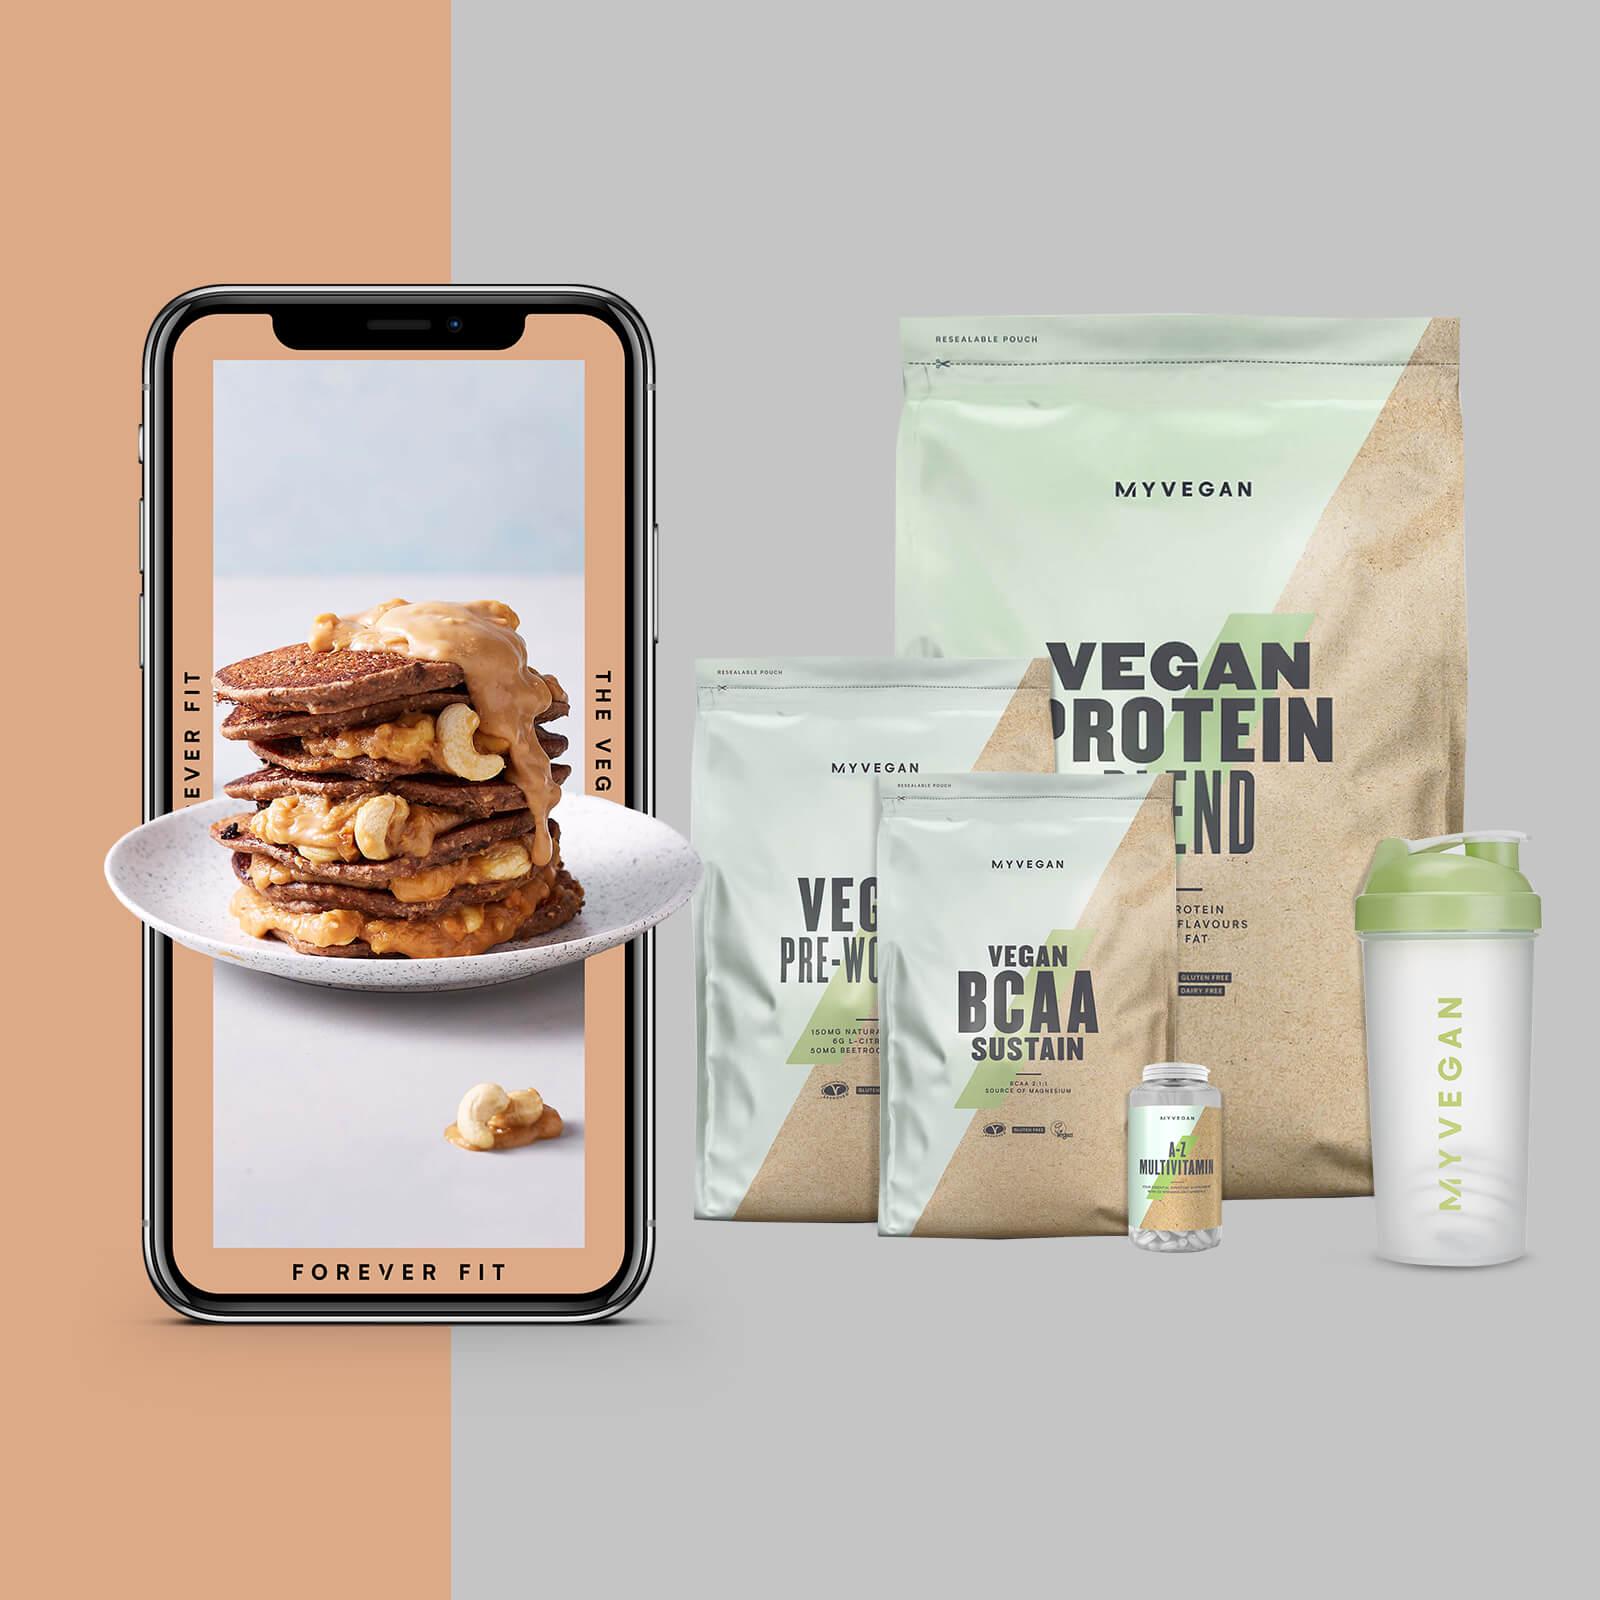 Le Pack Vegan + Guide Entraînement et Nutrition Offert - Raspberry Lemonade - Lemon Tea - Strawberry